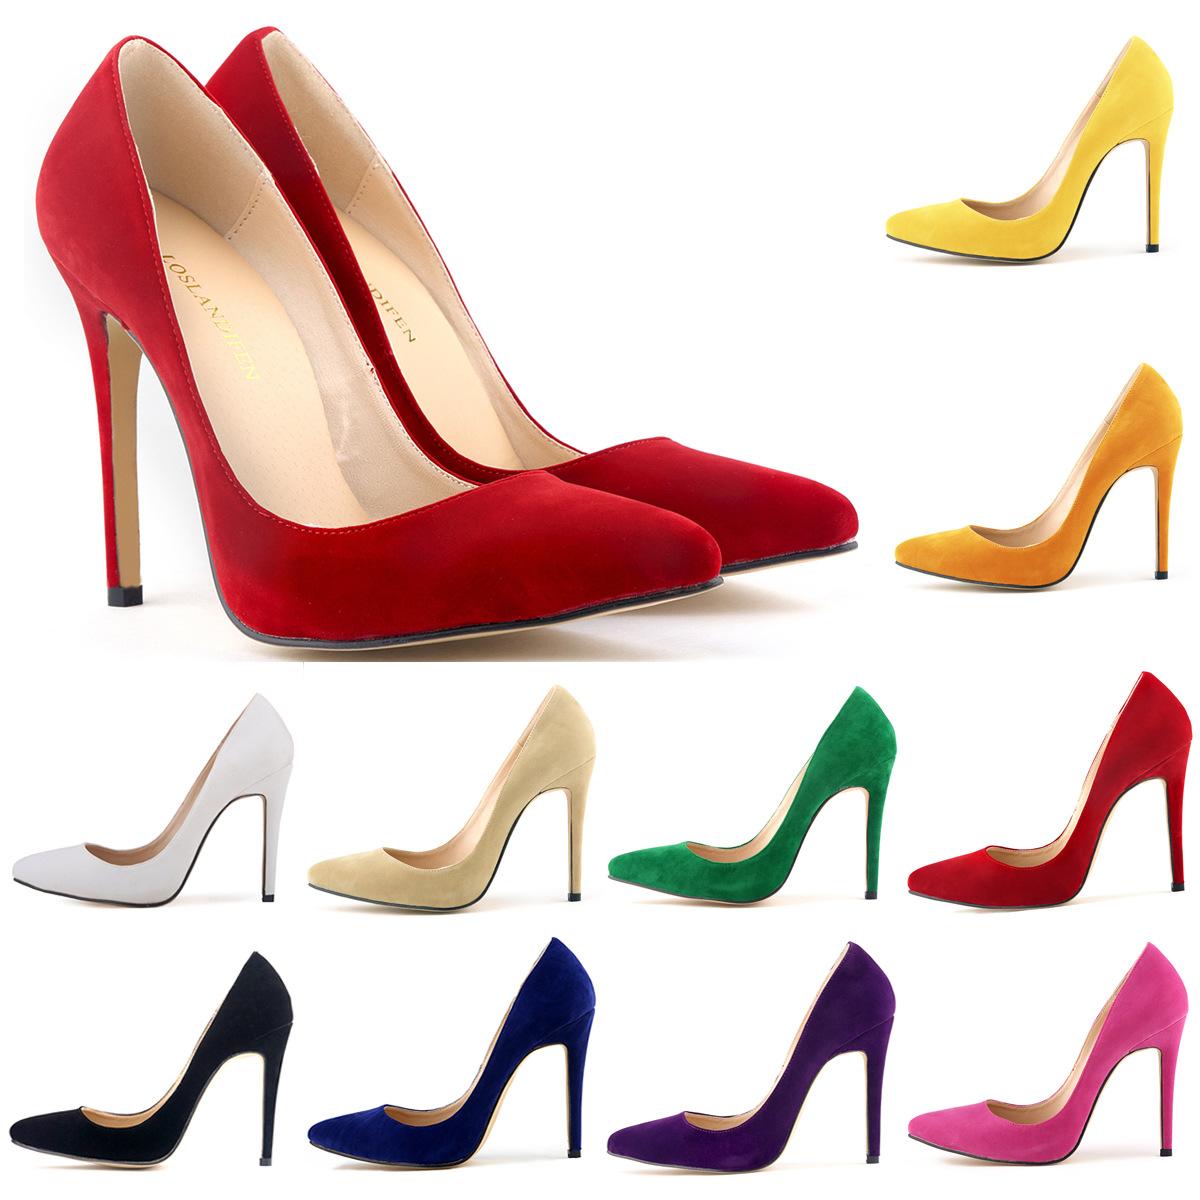 2015 Classic sexy summer women flock thin high heels pointed toe women's shoes woman highheels pumps